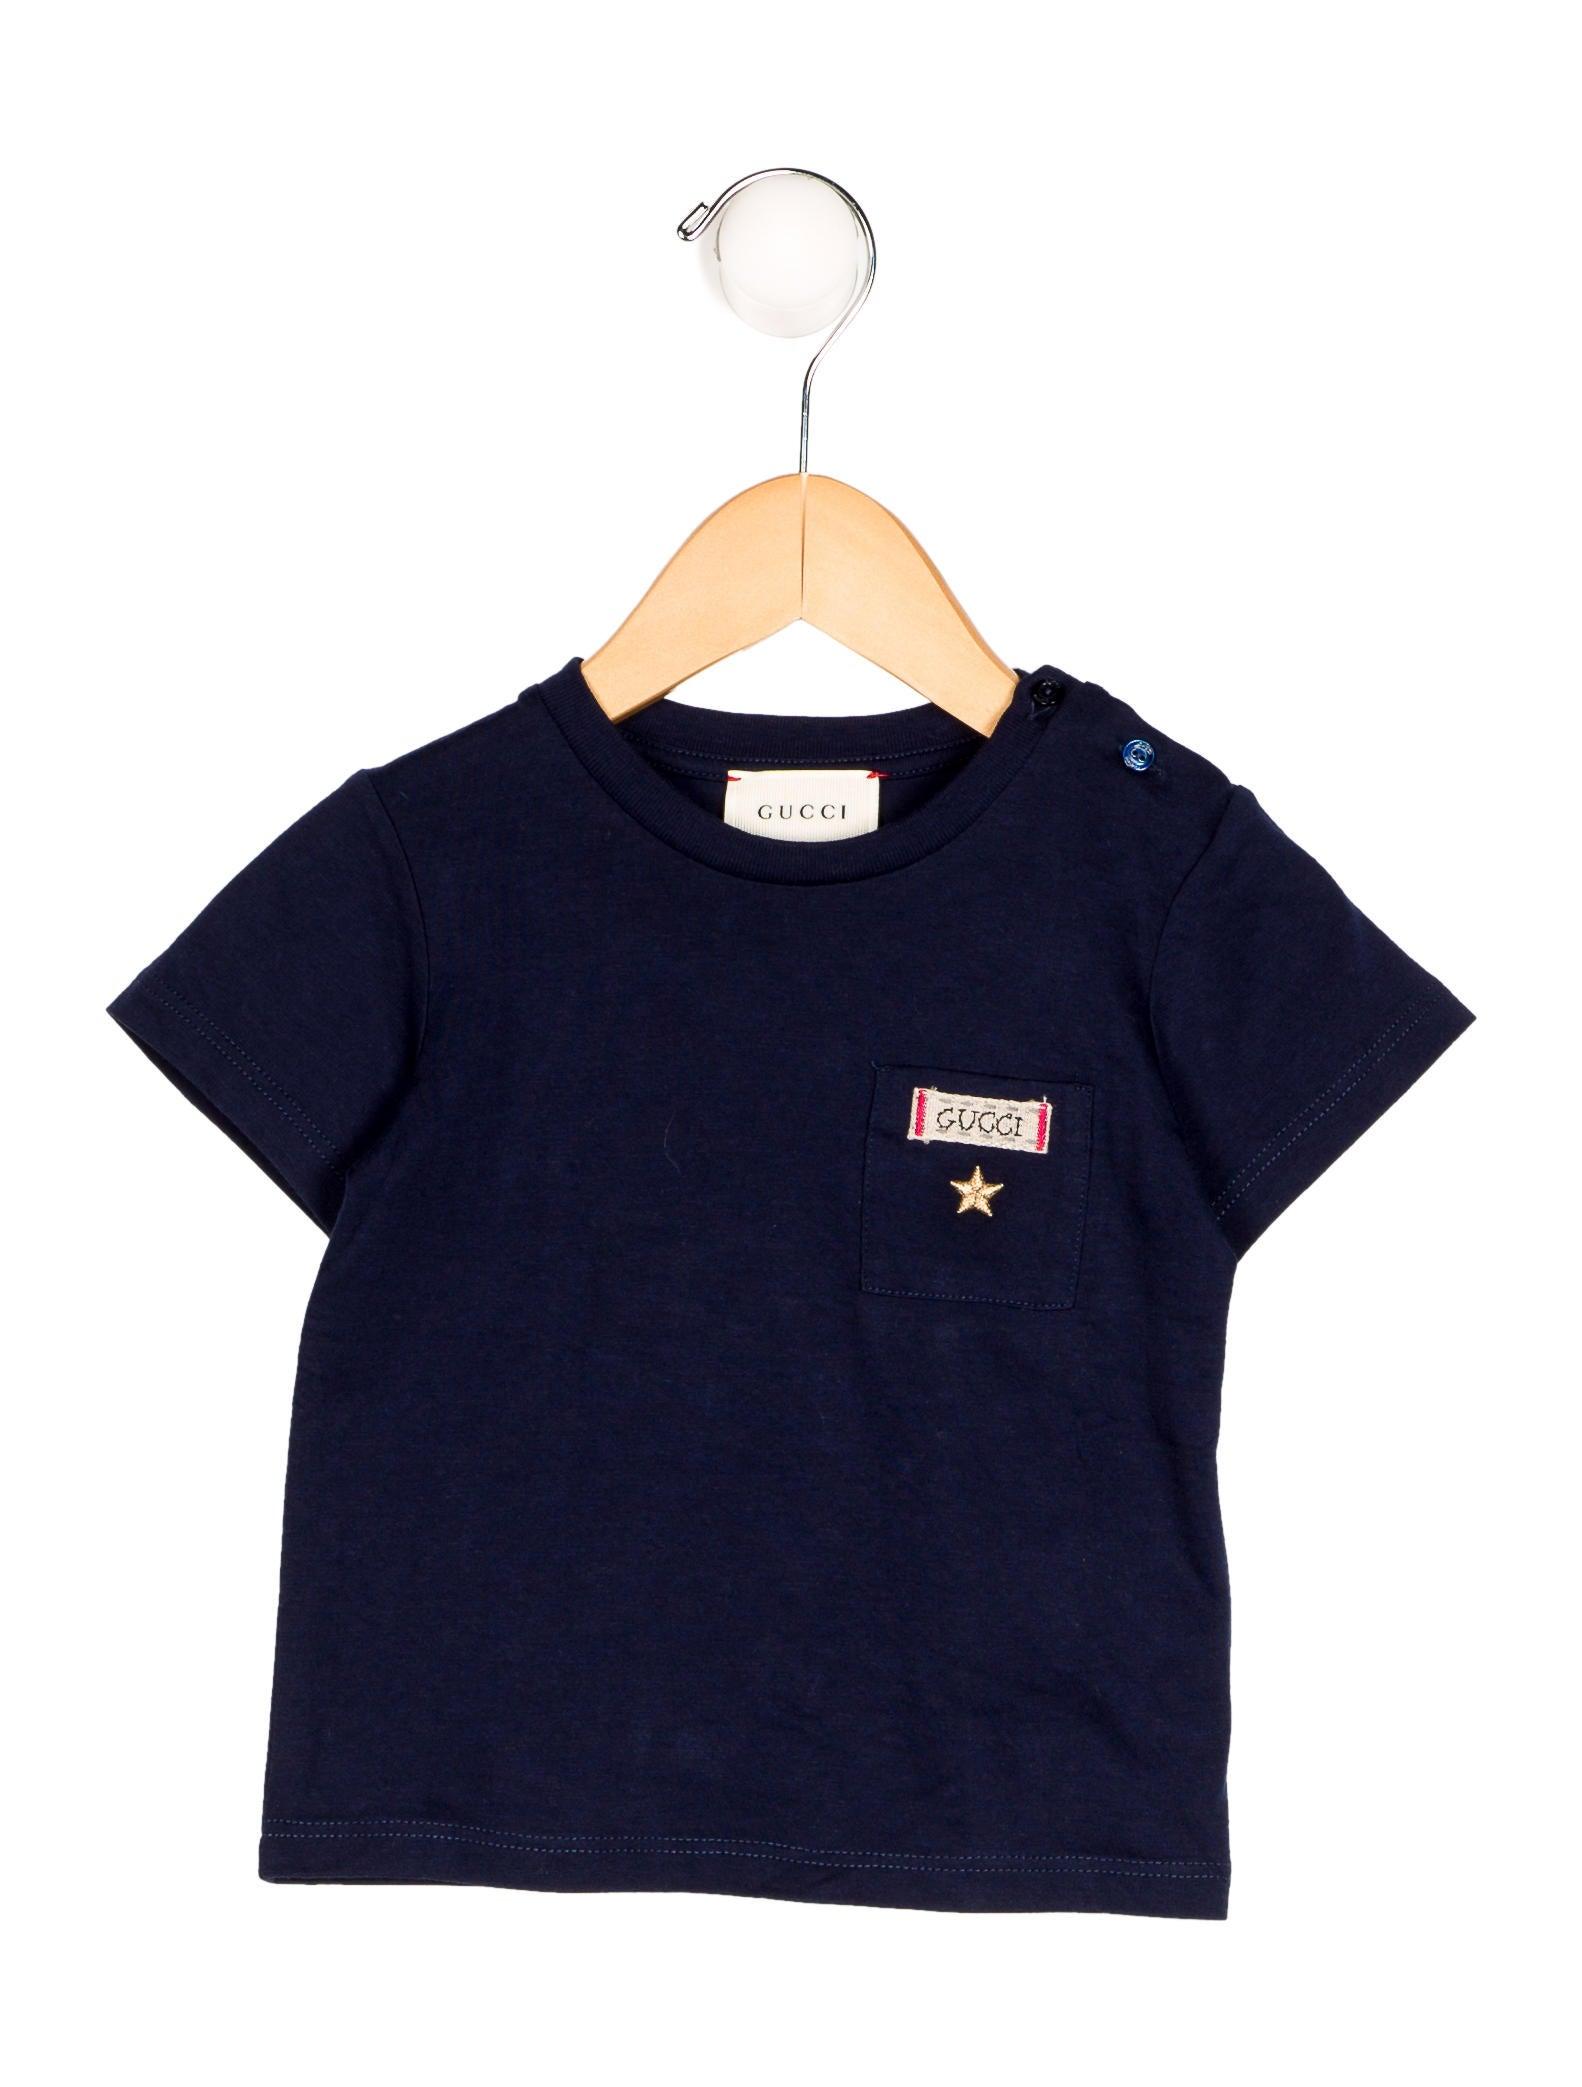 Gucci boys 39 logo pocket t shirt w tags boys guc136089 for Boys pocket t shirt